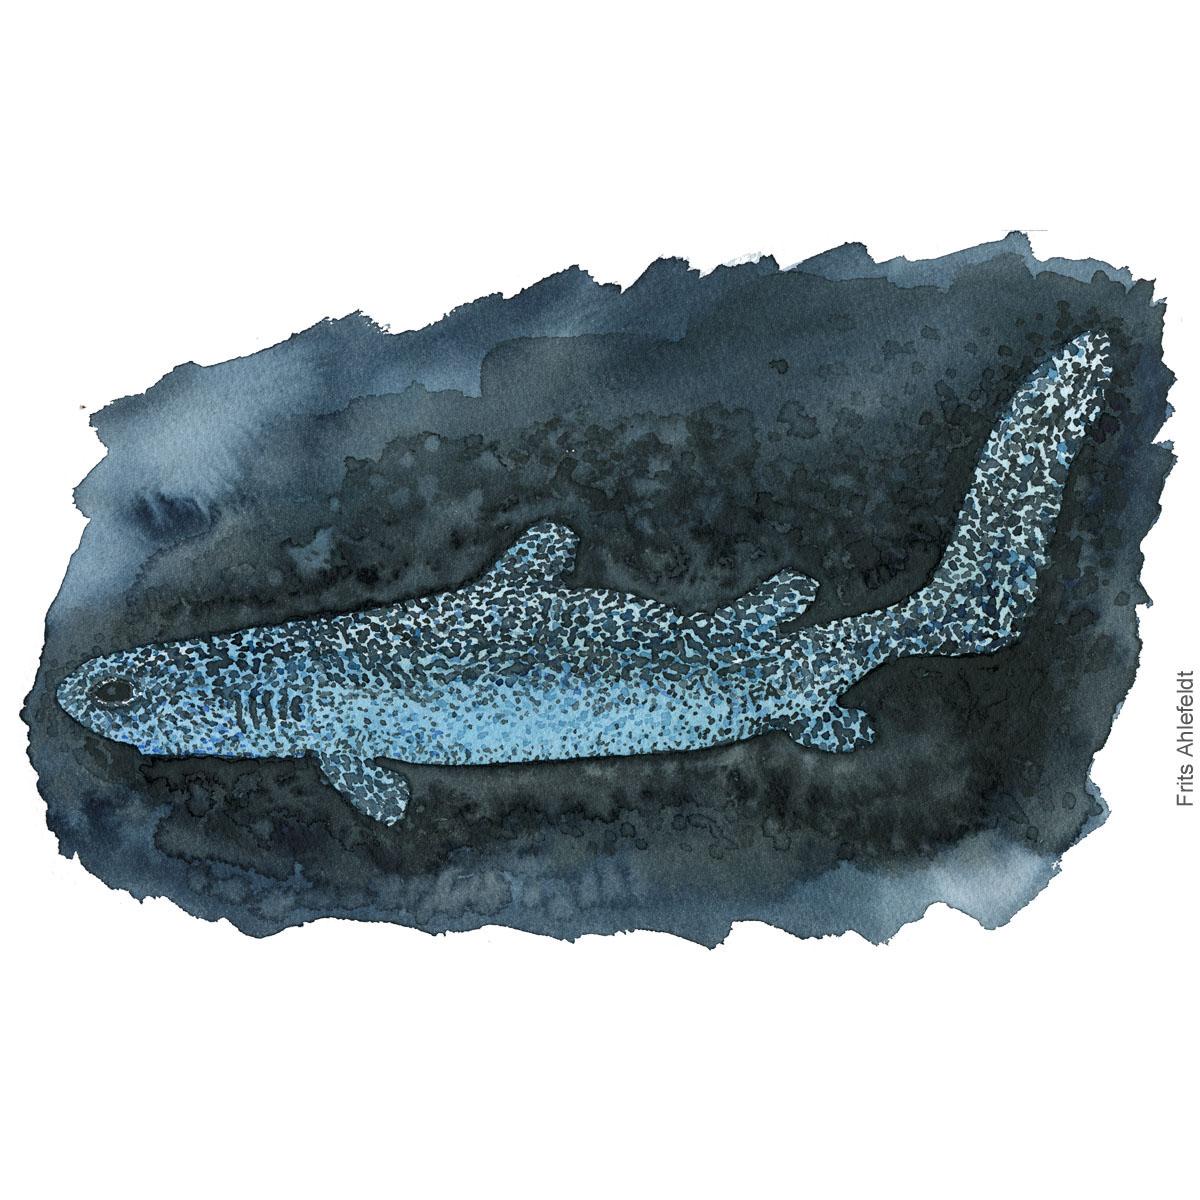 Kitefin shark fish watercolor illustration. Painting by Frits Ahlefeldt. Fiske akvarel